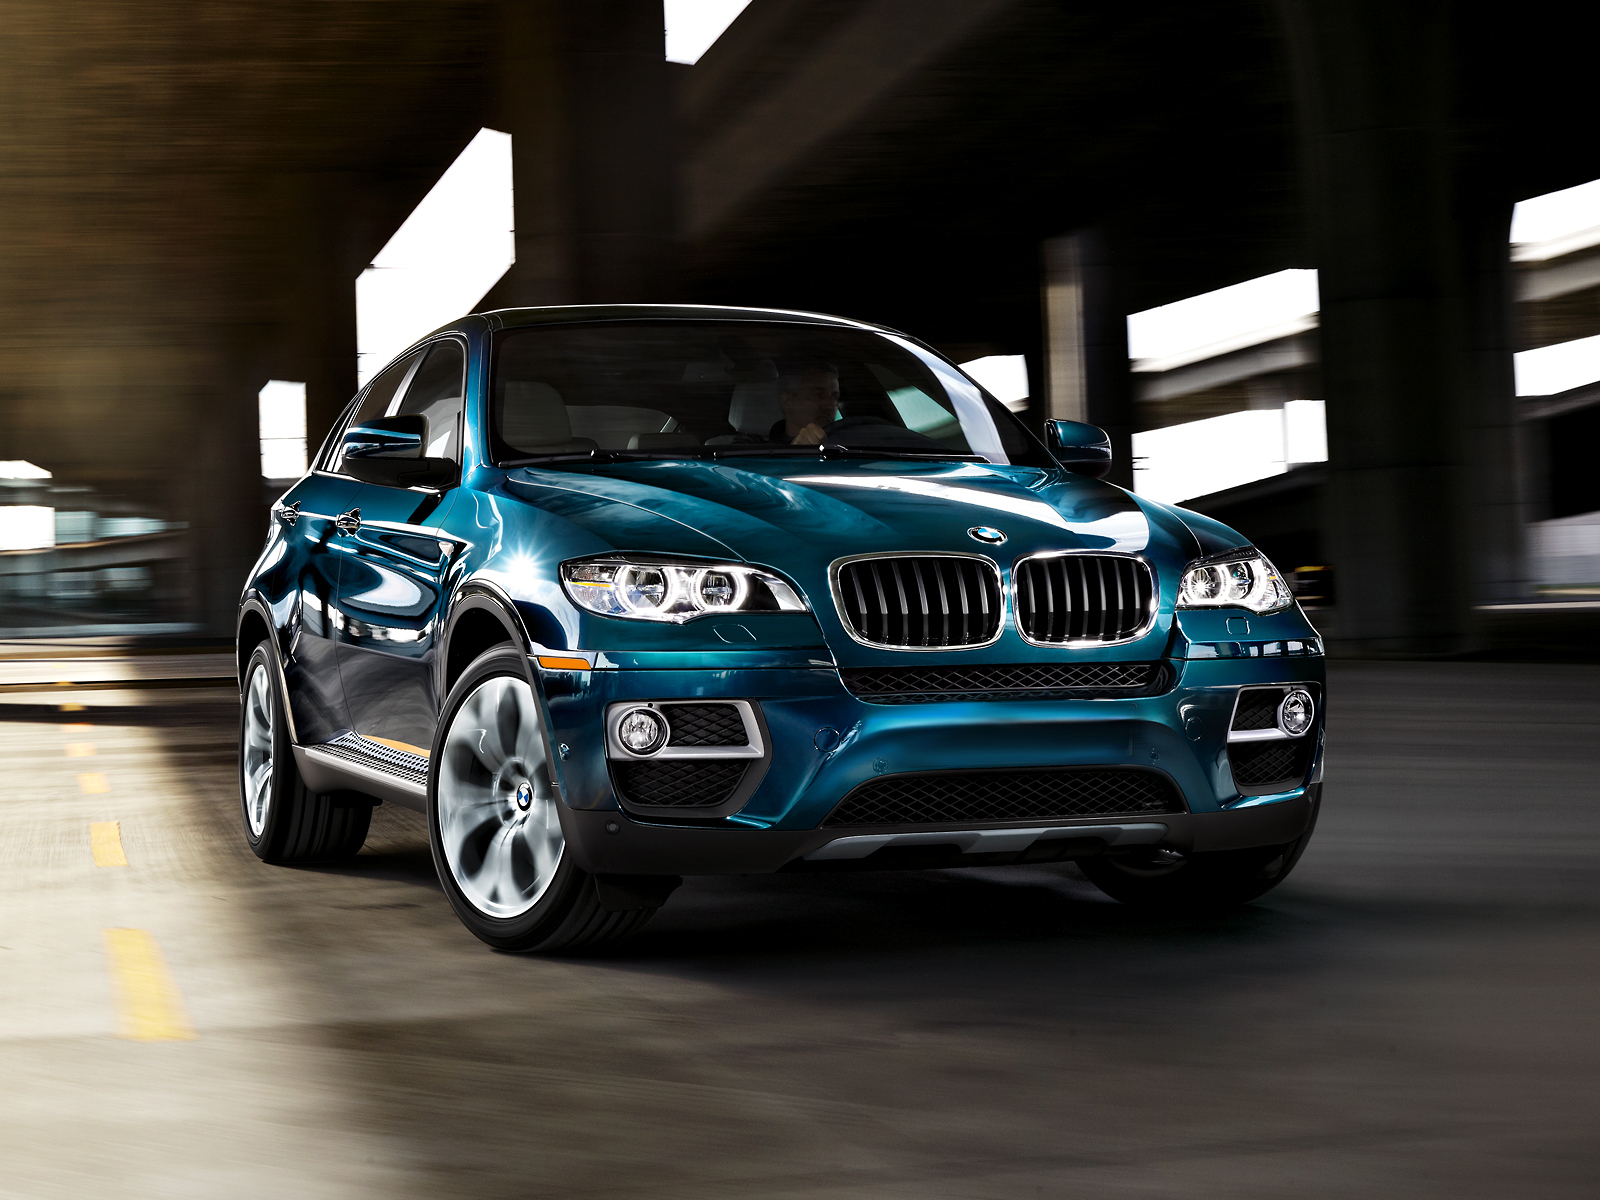 BMW X6 35I interior